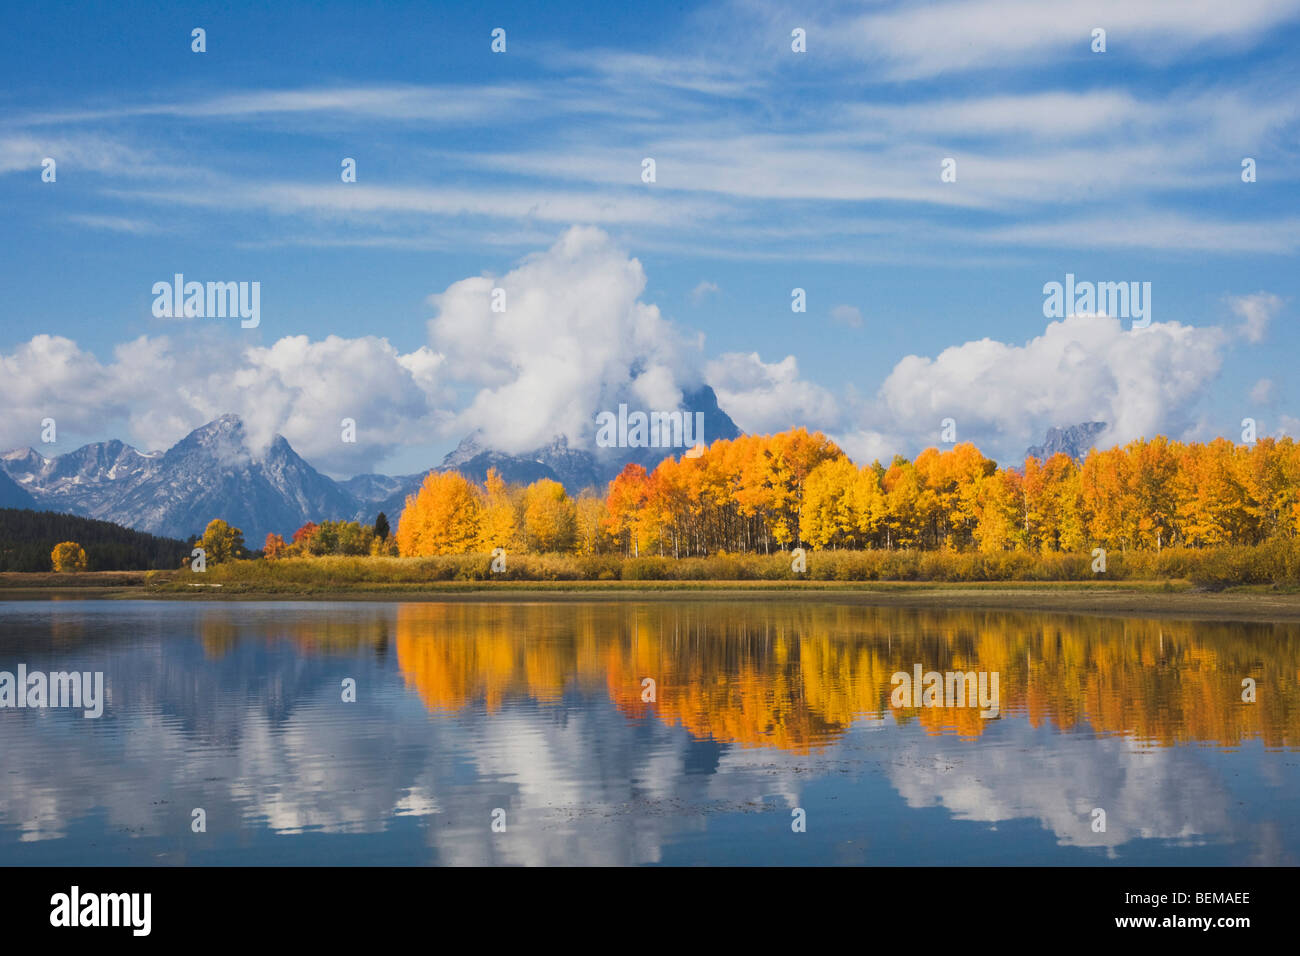 Lanca di flettersi in corrispondenza di sunrise, Snake River, Grand Teton NP,Wyoming, STATI UNITI D'AMERICA Immagini Stock